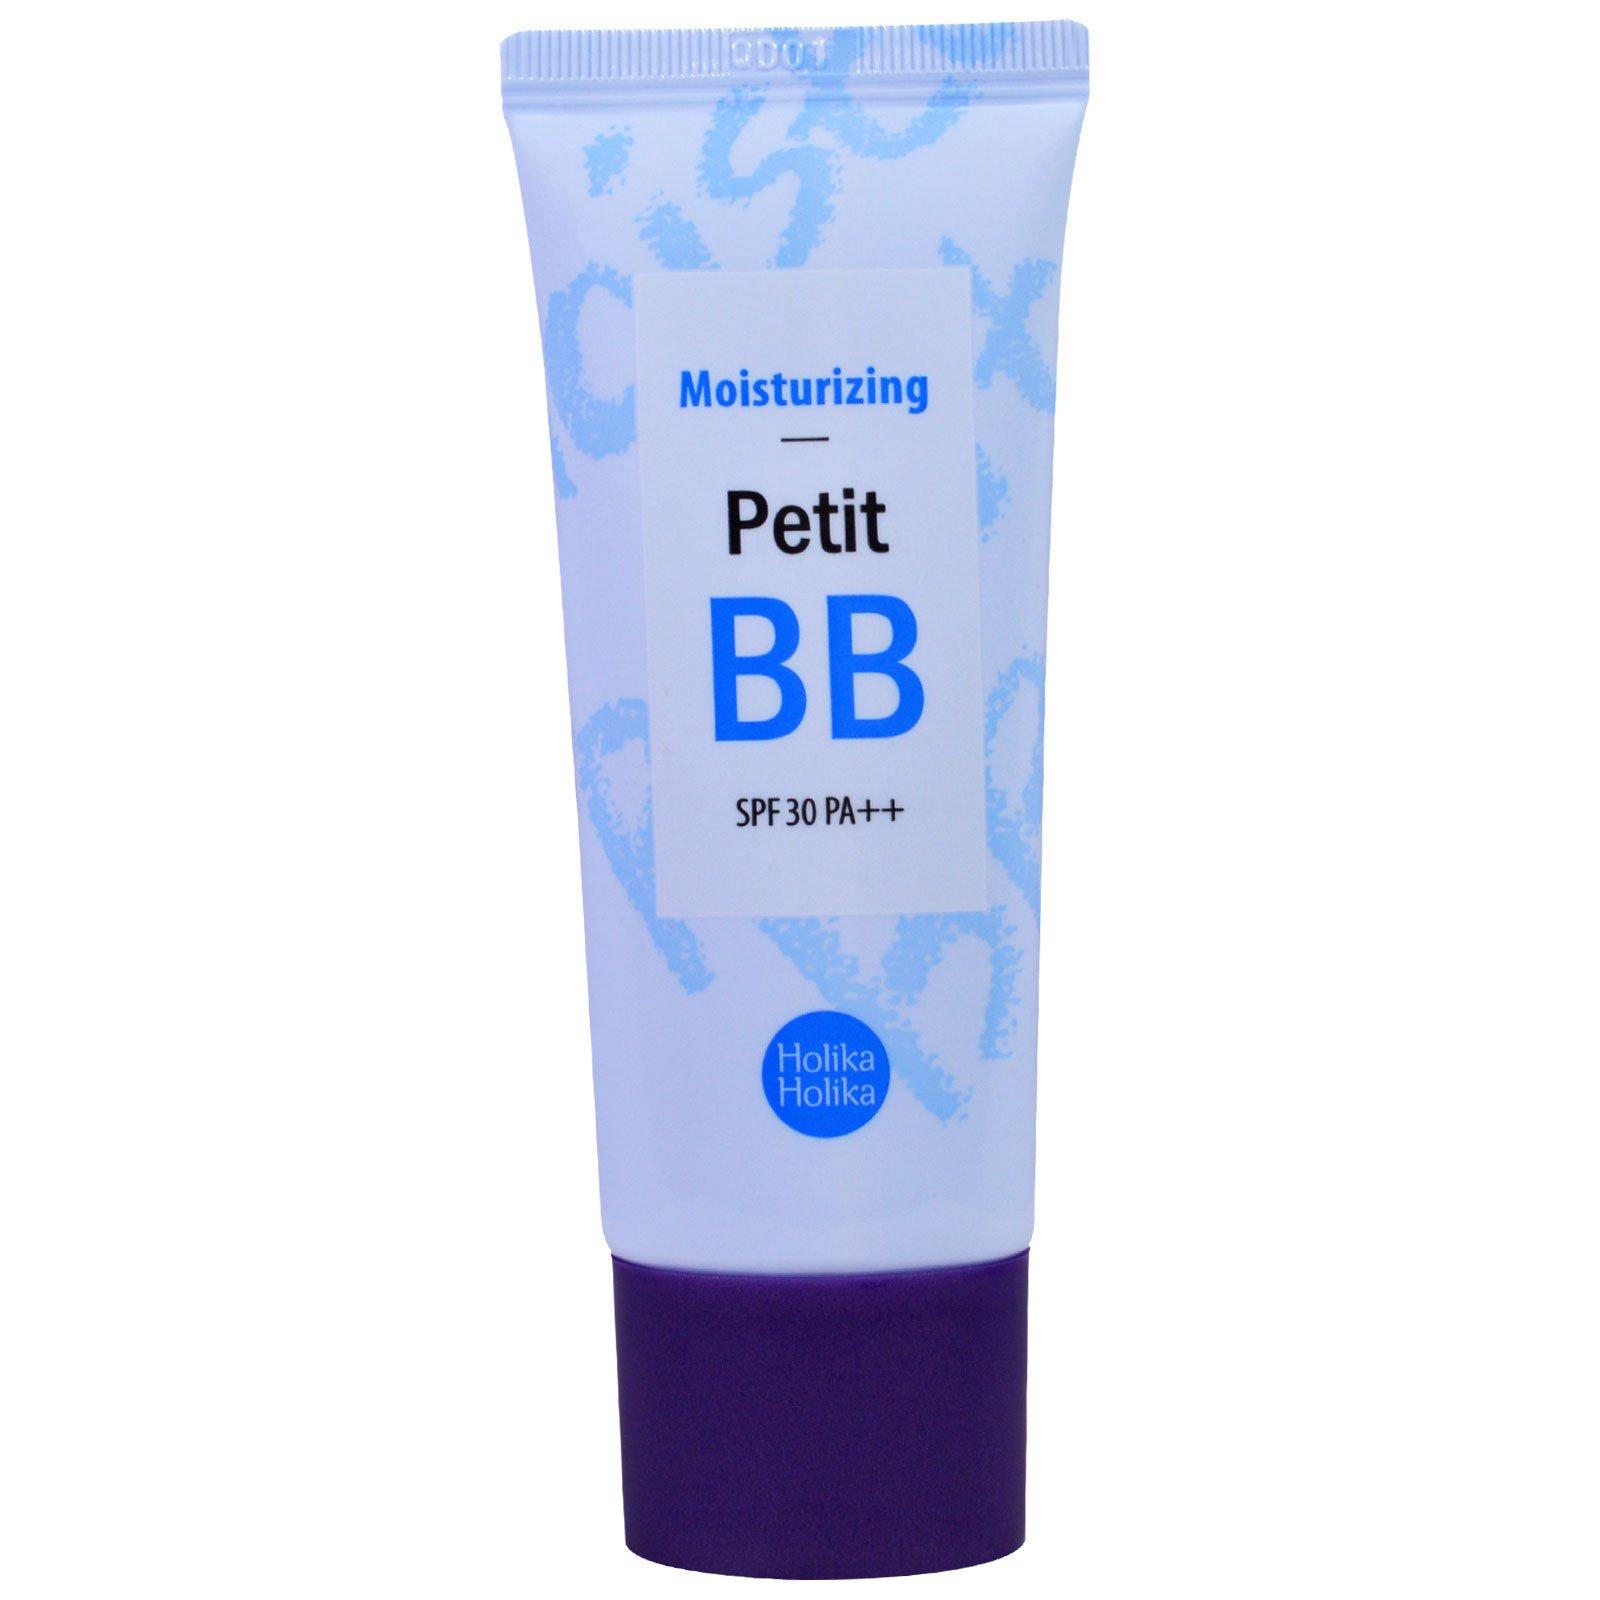 Holika Holika, Moisturizing Petit BB, SPF 30, 1 oz (30 ml)